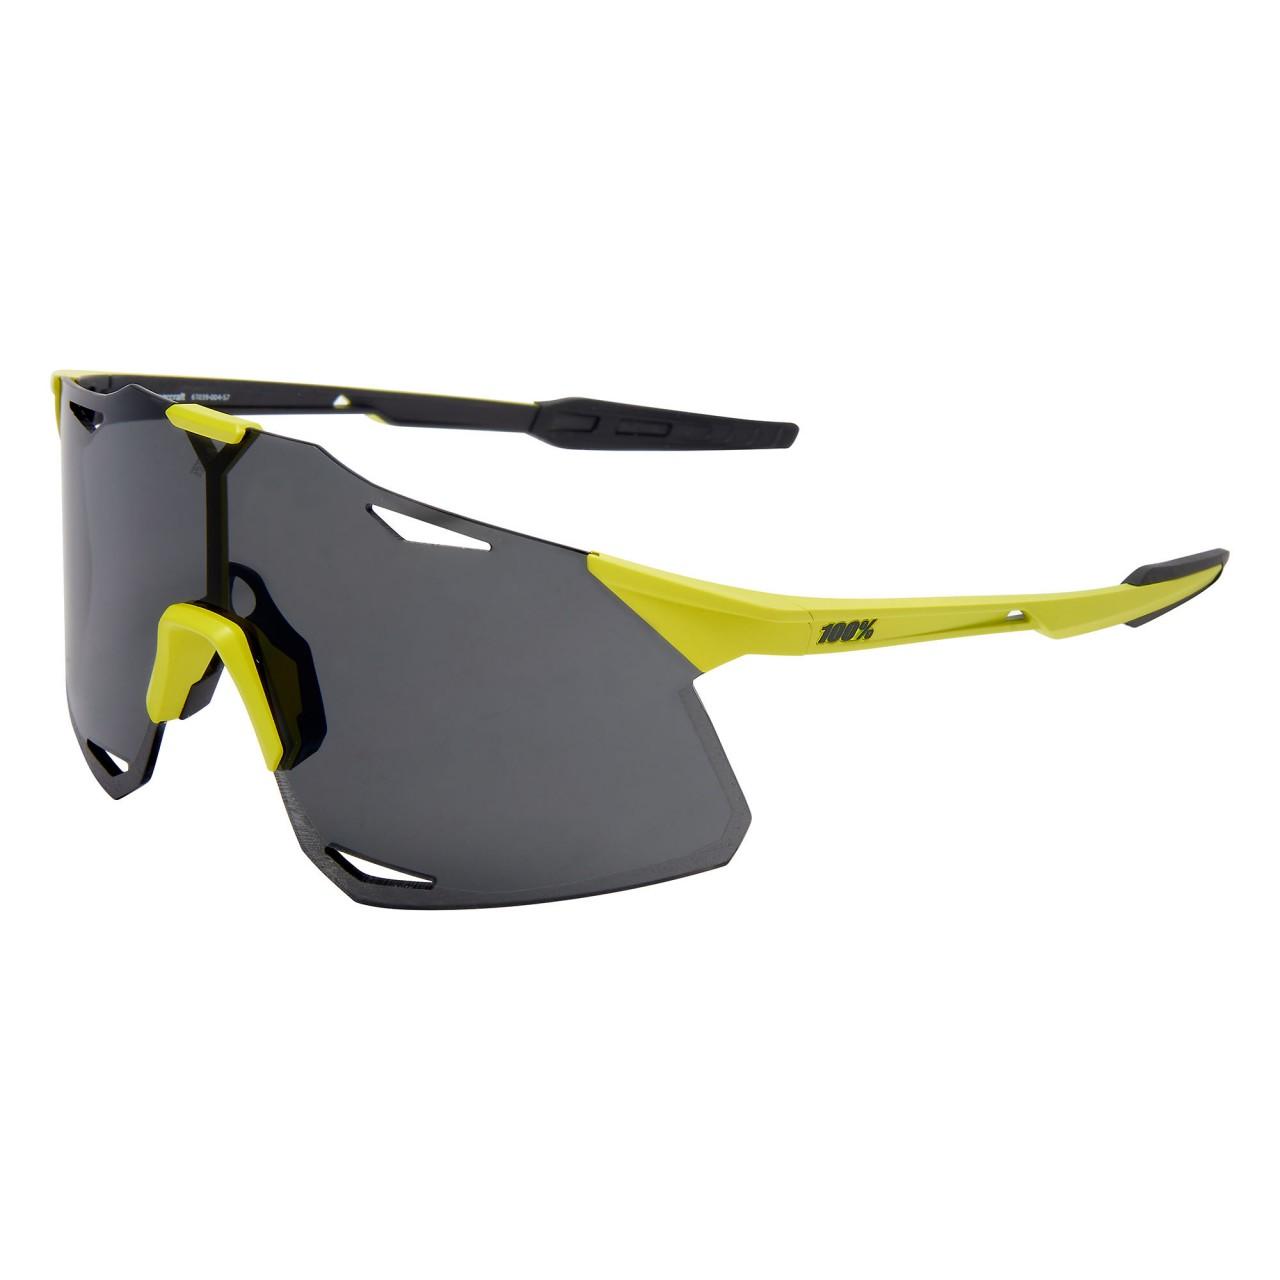 100% Hypercraft Smoke Lens Sunglasses | matte Banana